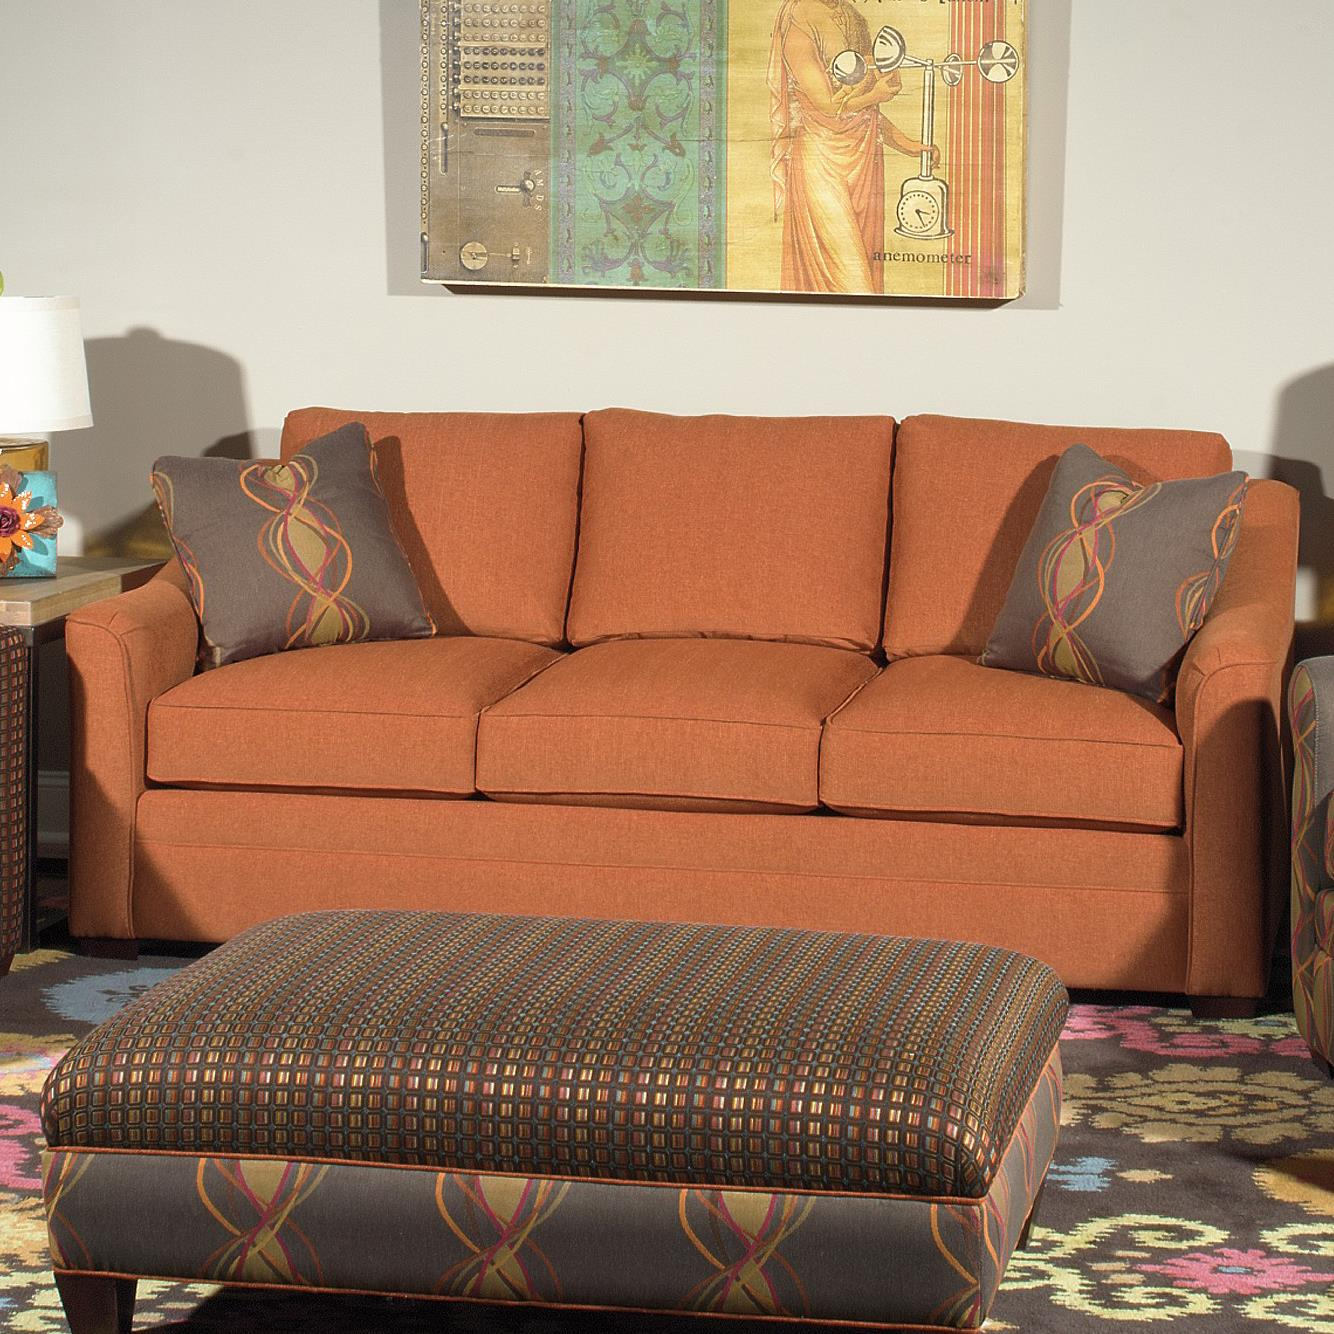 Admirable Craftmaster F9 Custom Collection Bcustomizable B 3 Seat Machost Co Dining Chair Design Ideas Machostcouk